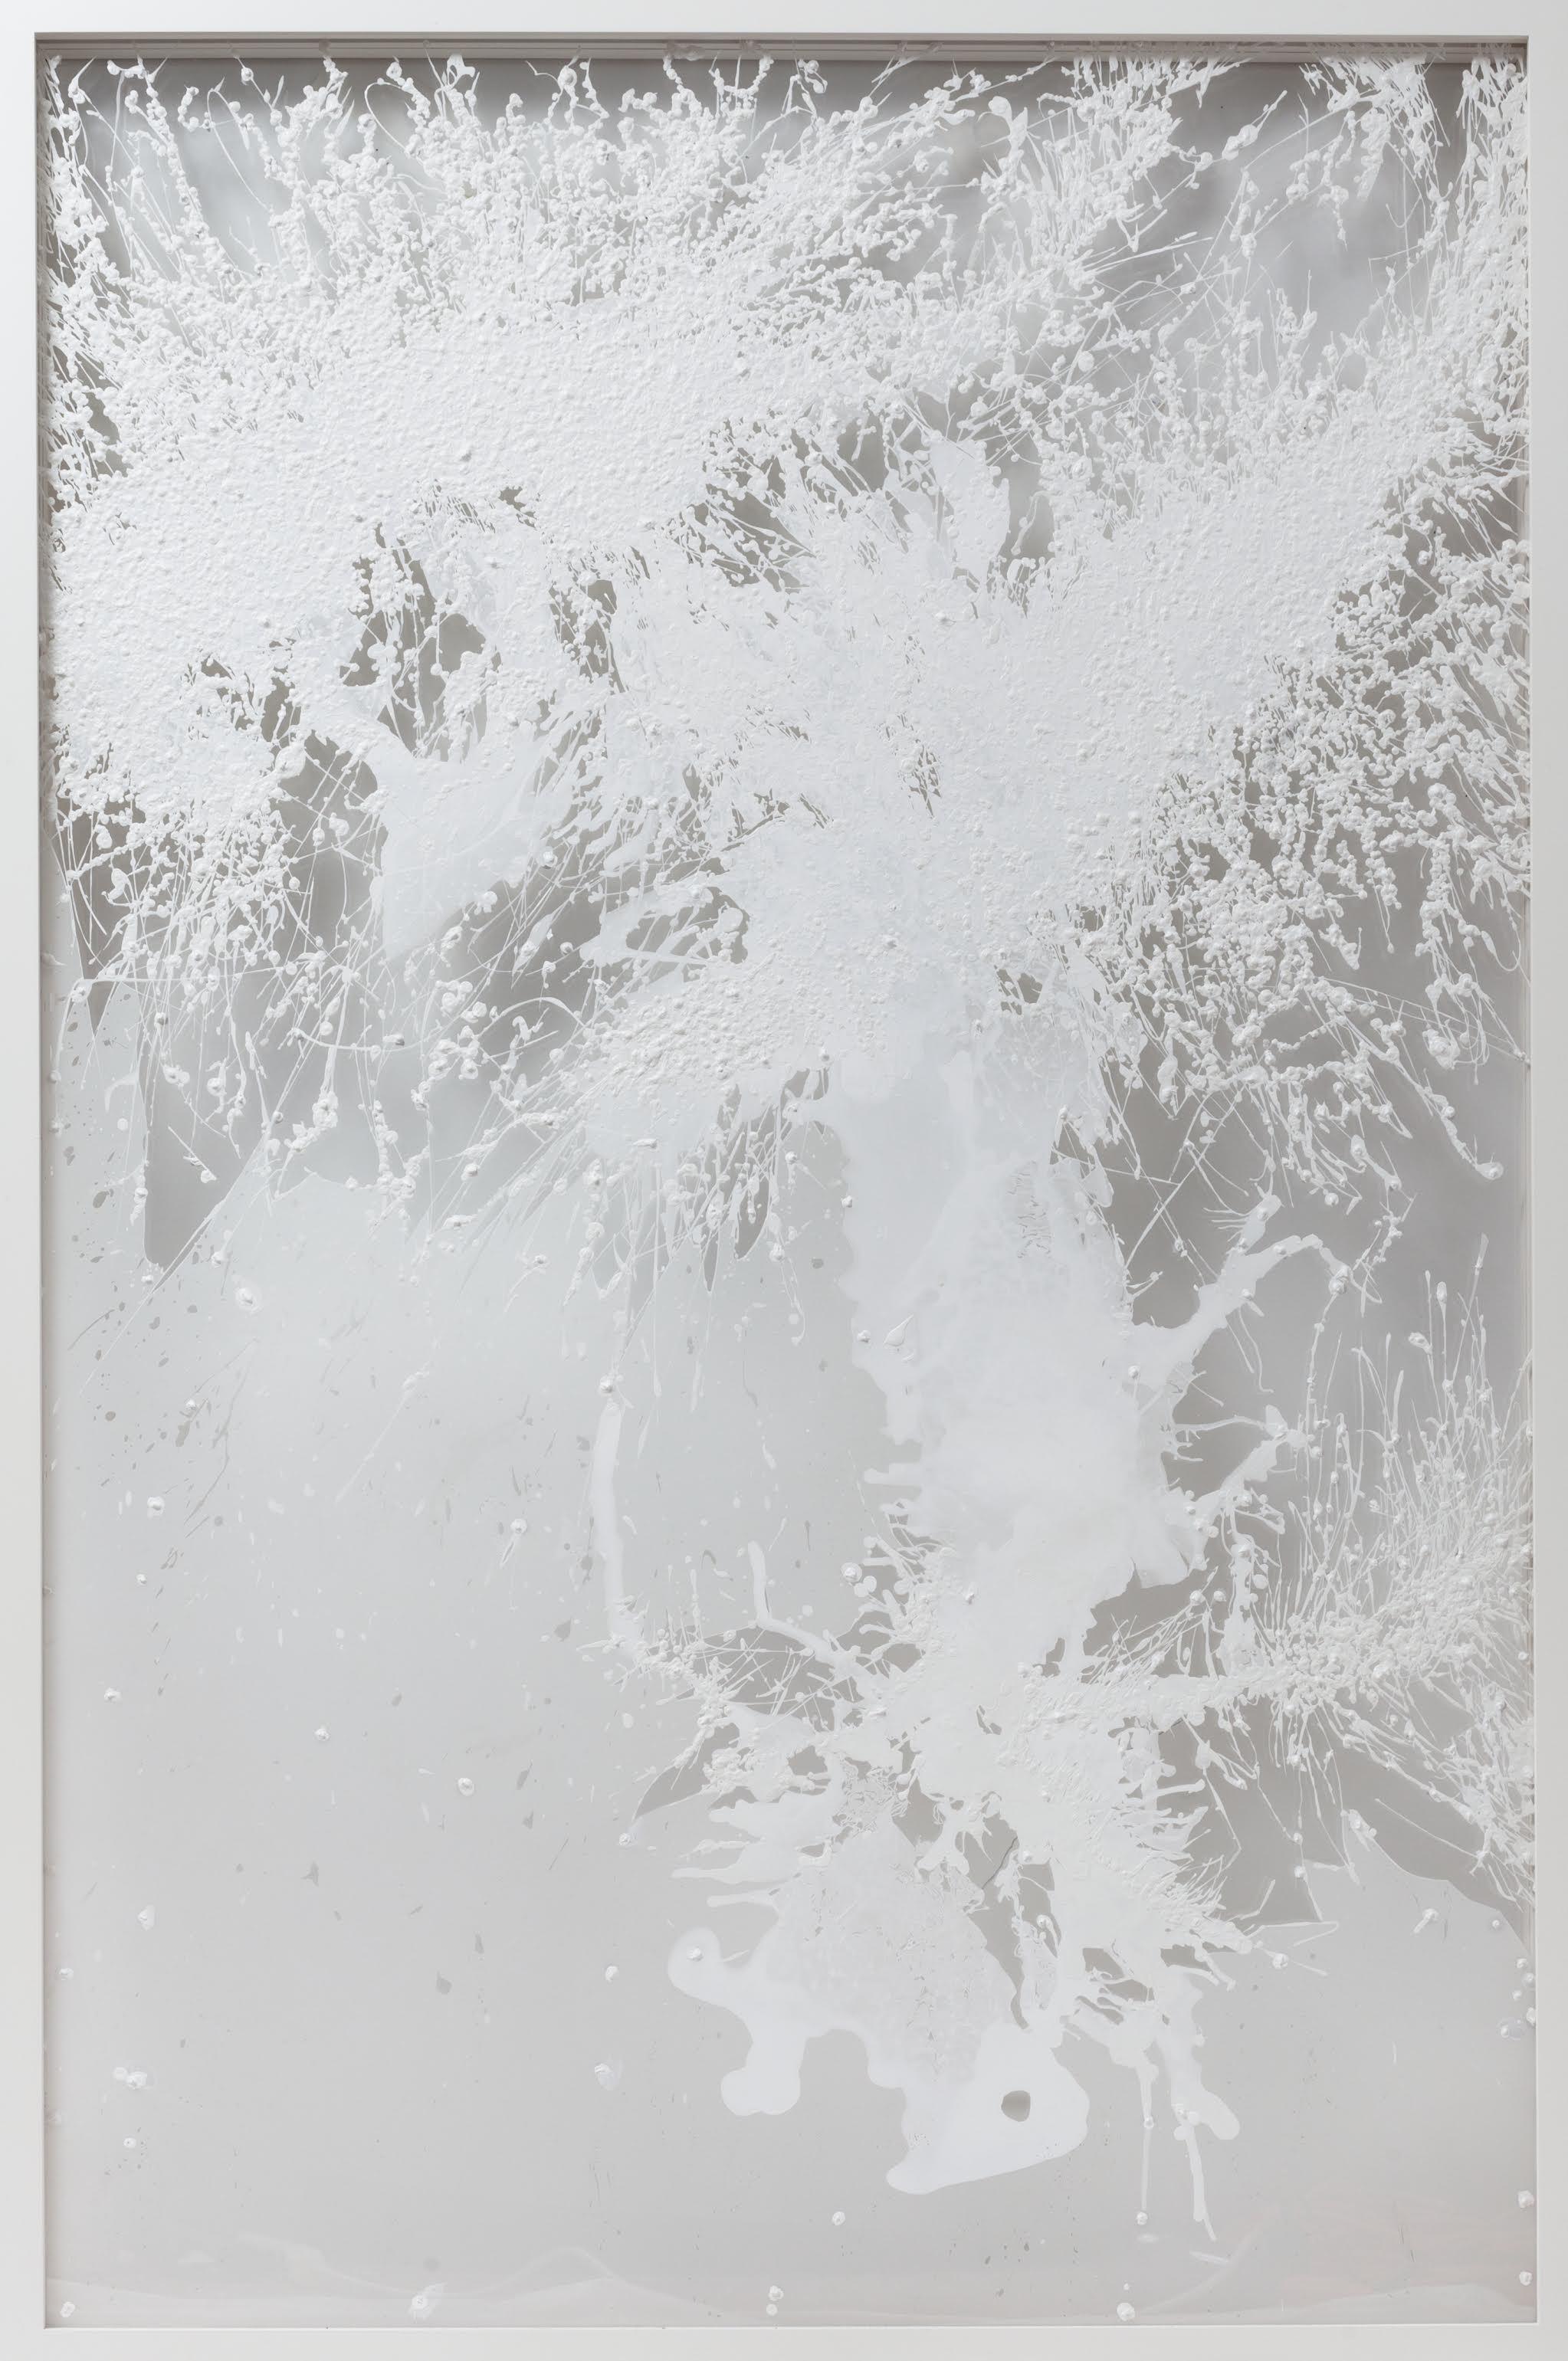 Chunky Tree, 2008  Acrylic, mylar, thread, plexi-glass  64x 44inches